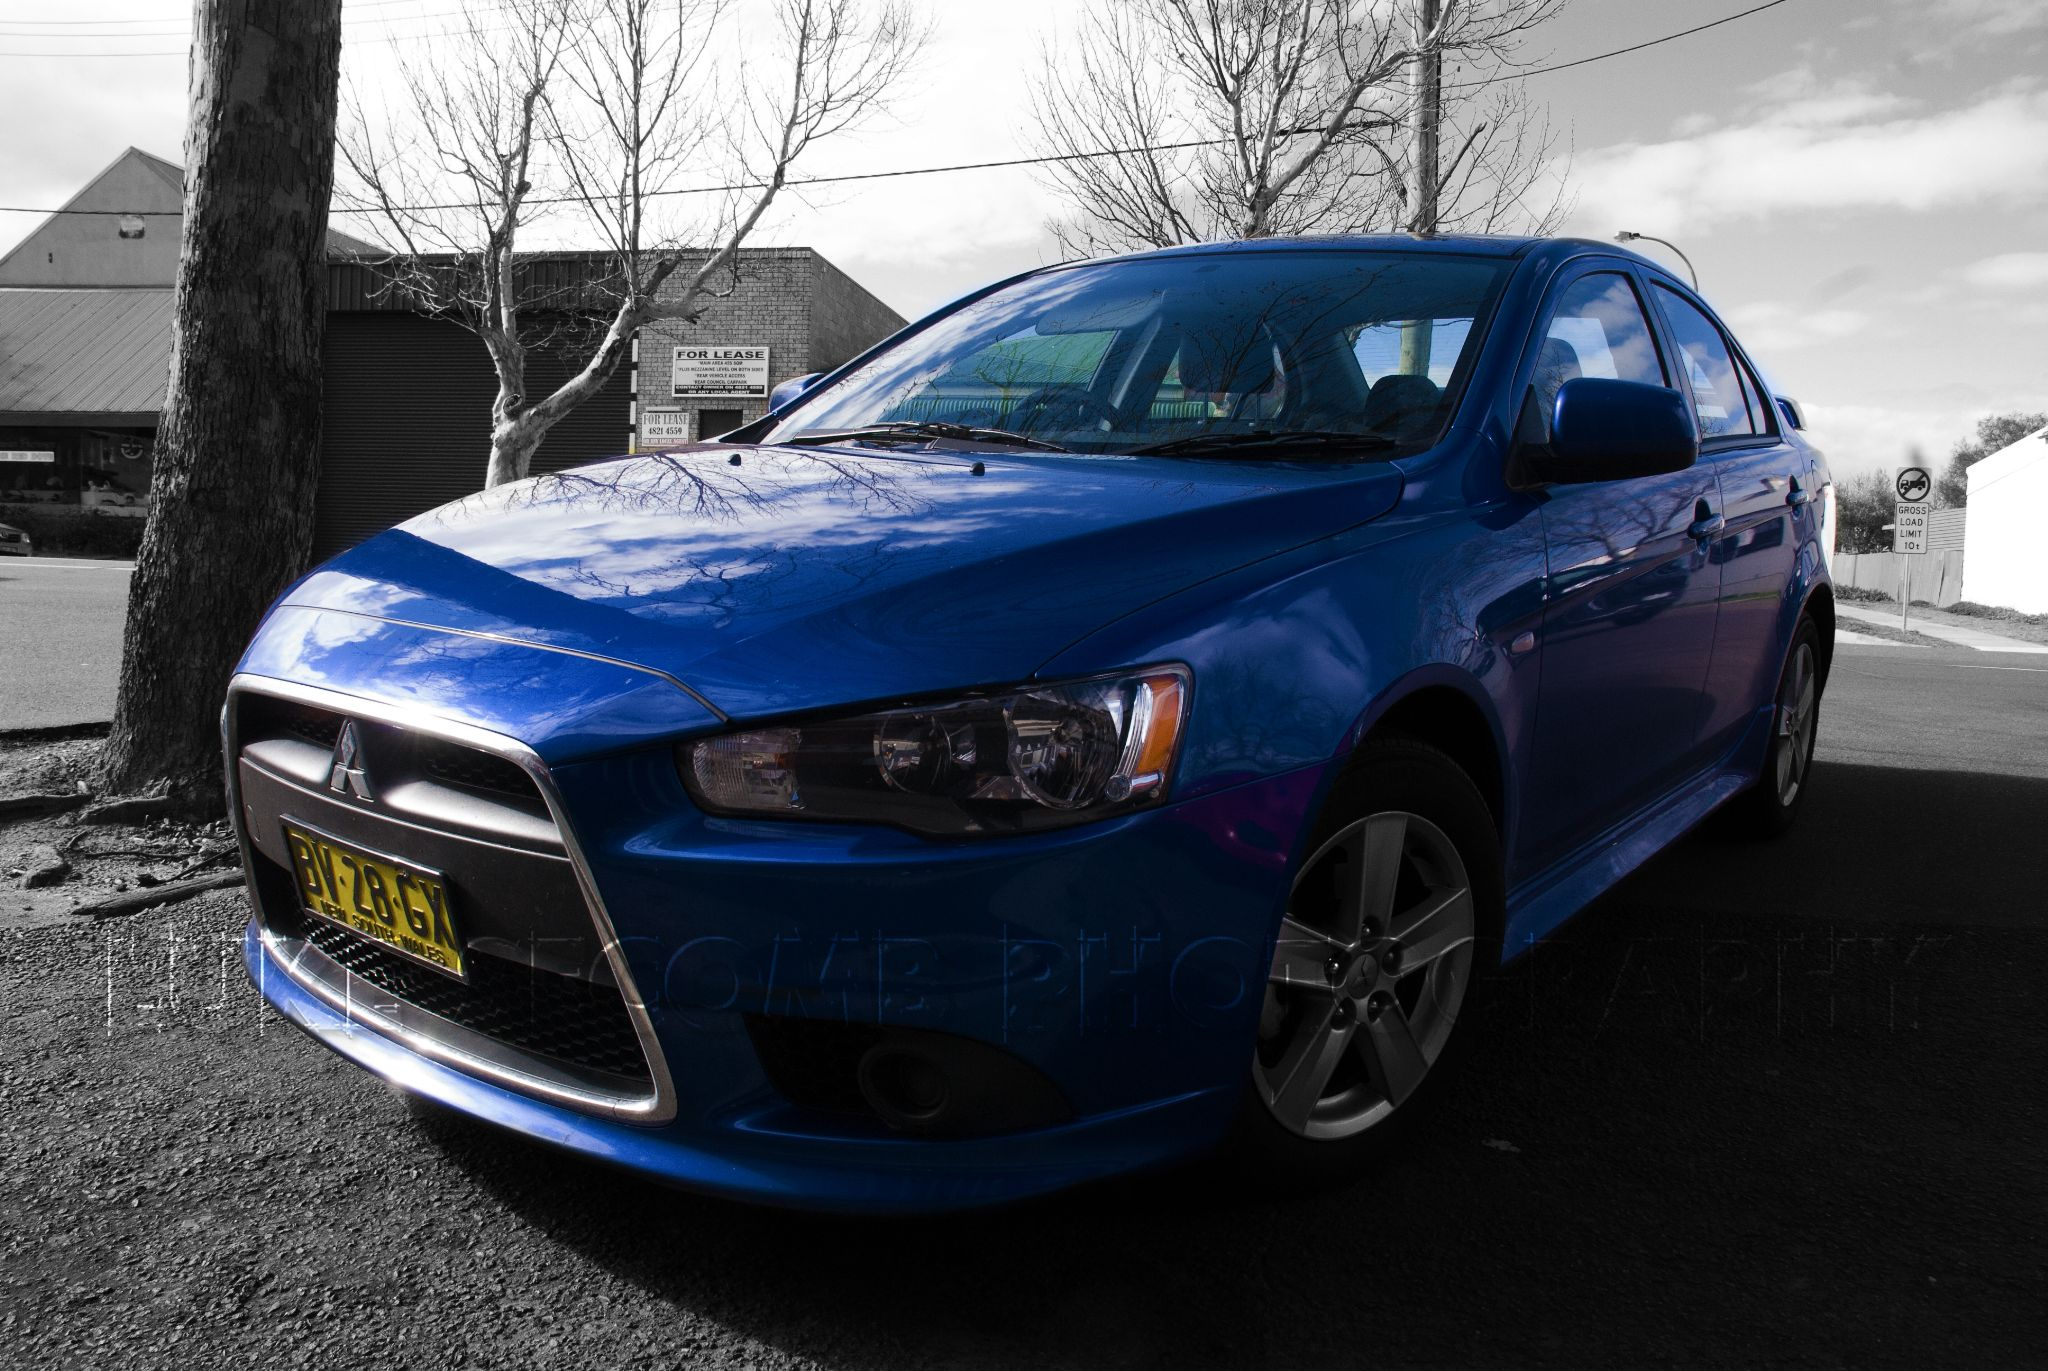 Blue Mitsubishi Lancer - Goulburn NSW by Luke Secomb